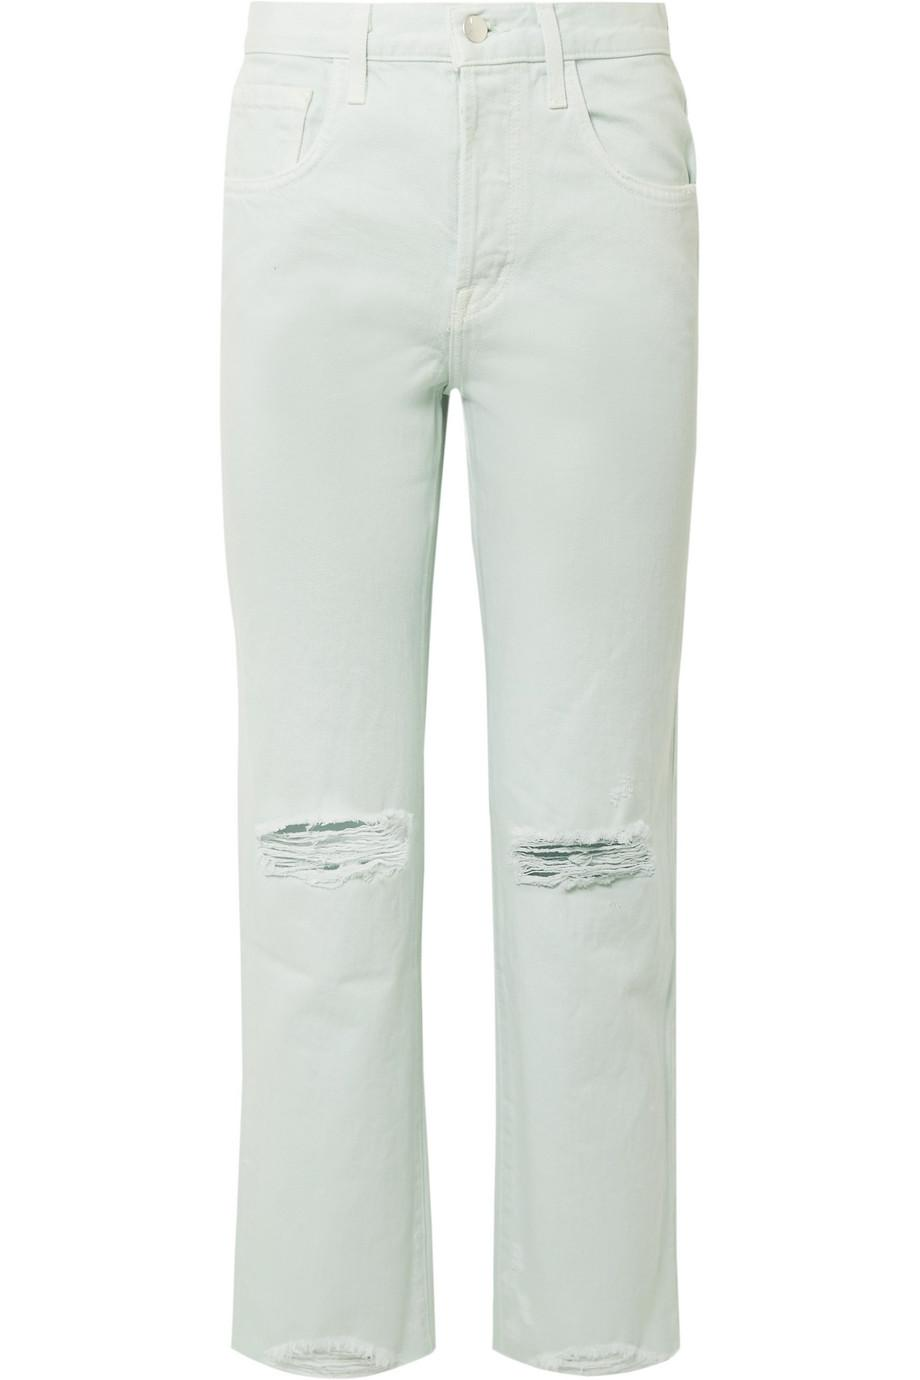 Wynne Distressed High-rise Straight-leg Jeans - Mint J Brand ba3ylD